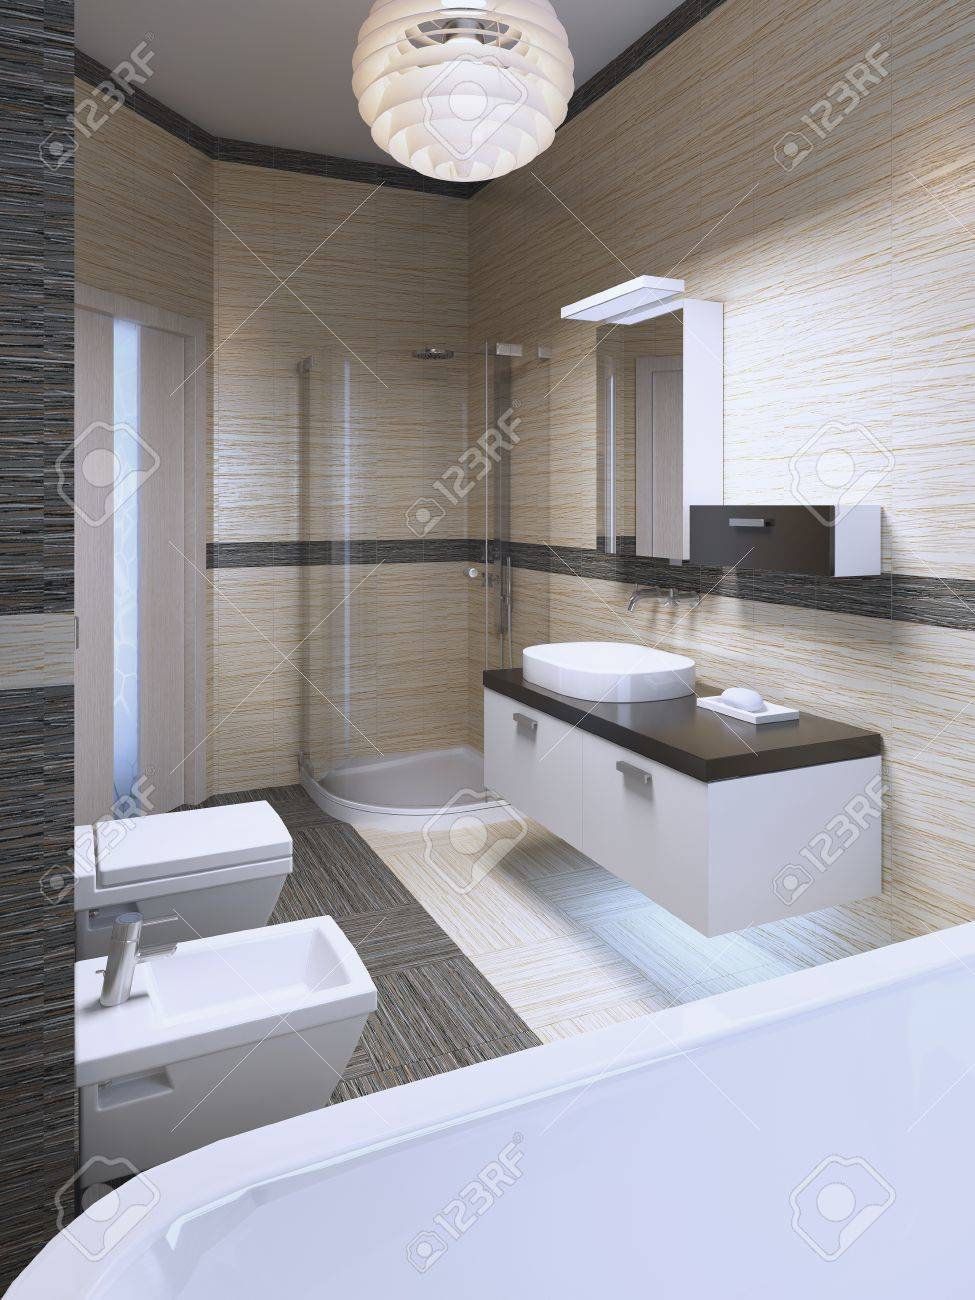 foto di bagni moderni. great arredo bagni mercatone uno bagno ... - Bagni Moderni Bellissimi